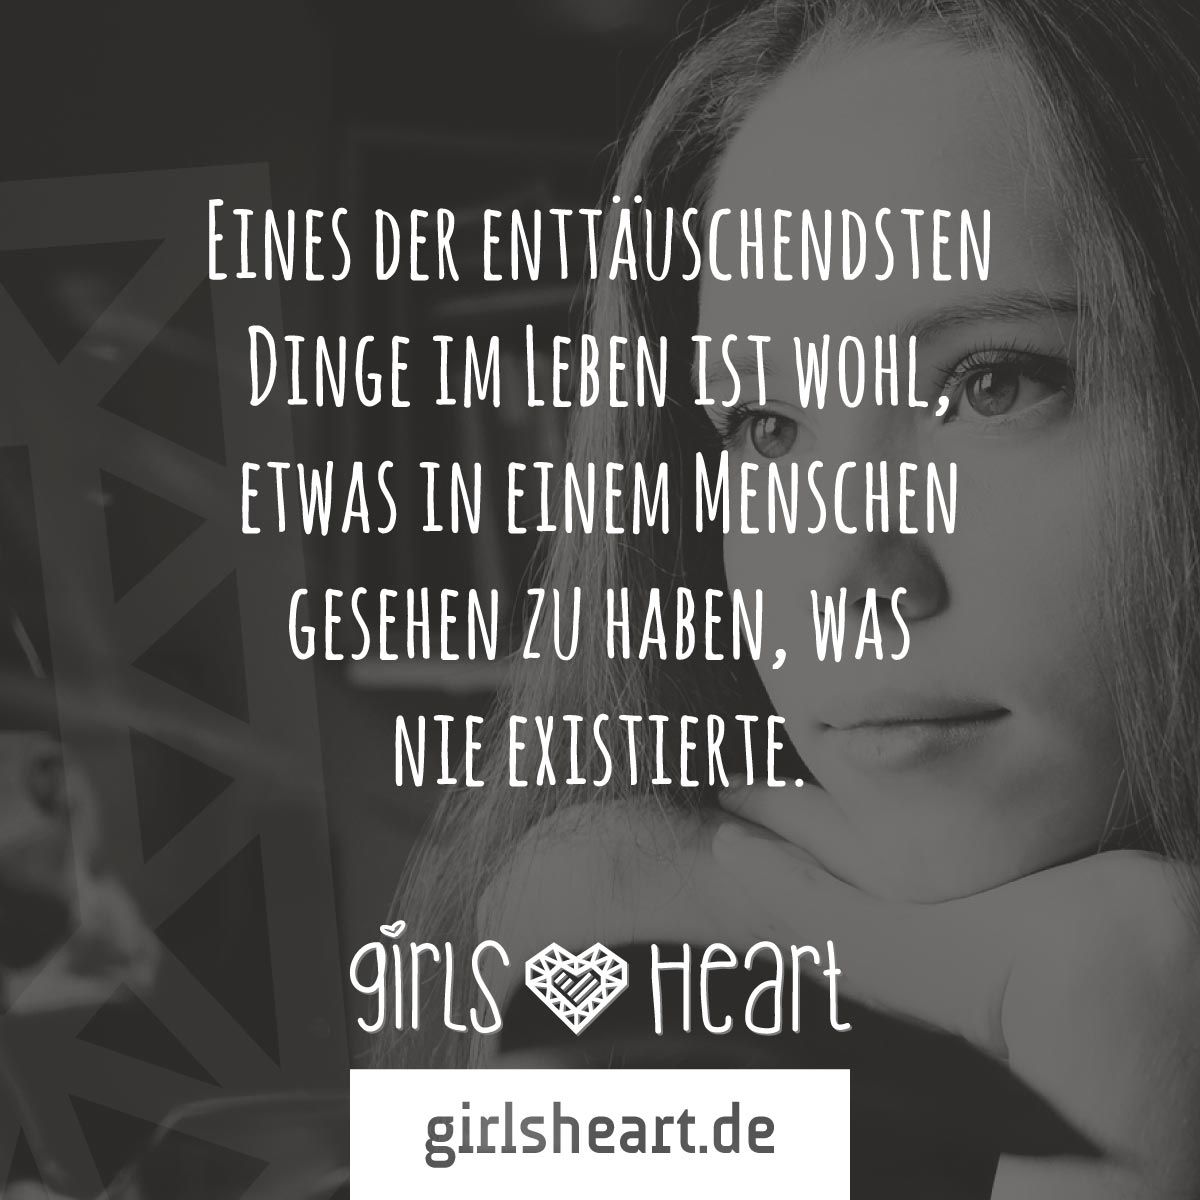 sprüche enttäuschung liebe Mehr Sprüche auf: .girlsheart.de #enttäuschung #mensch #freund  sprüche enttäuschung liebe